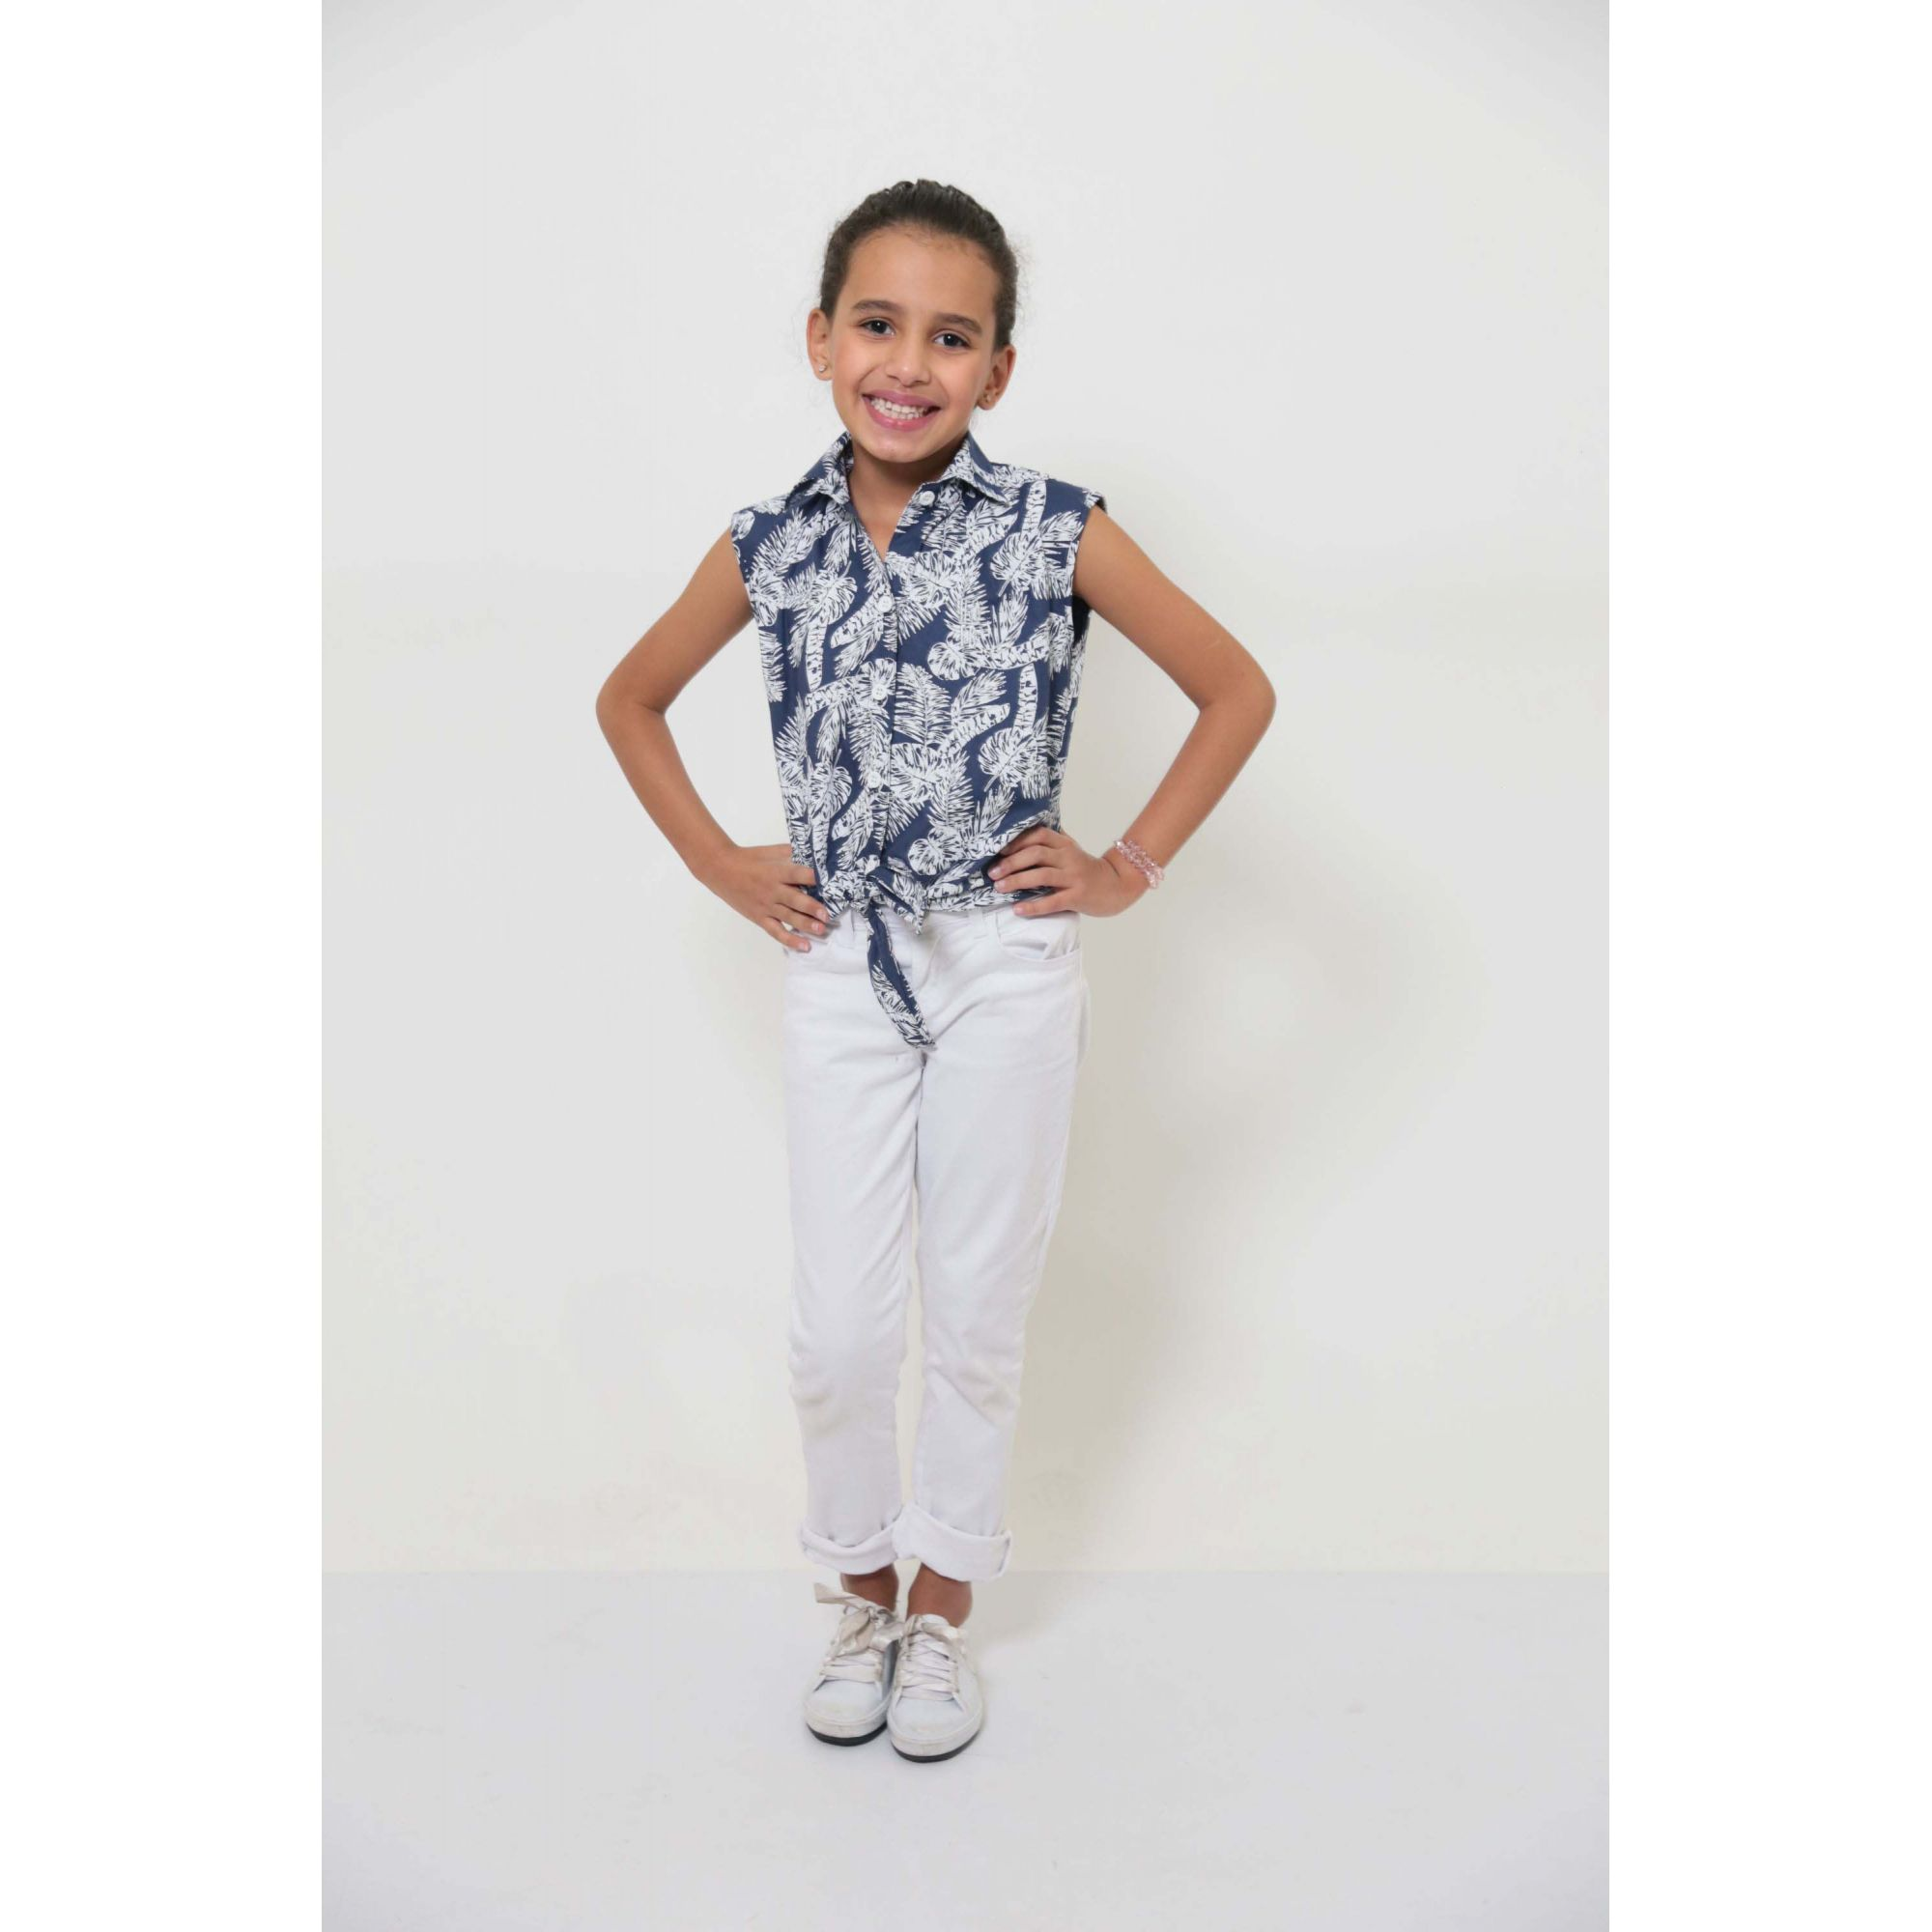 Camisa Social Sem Manga Azul Floresta Feminina Infantil  - Heitor Fashion Brazil